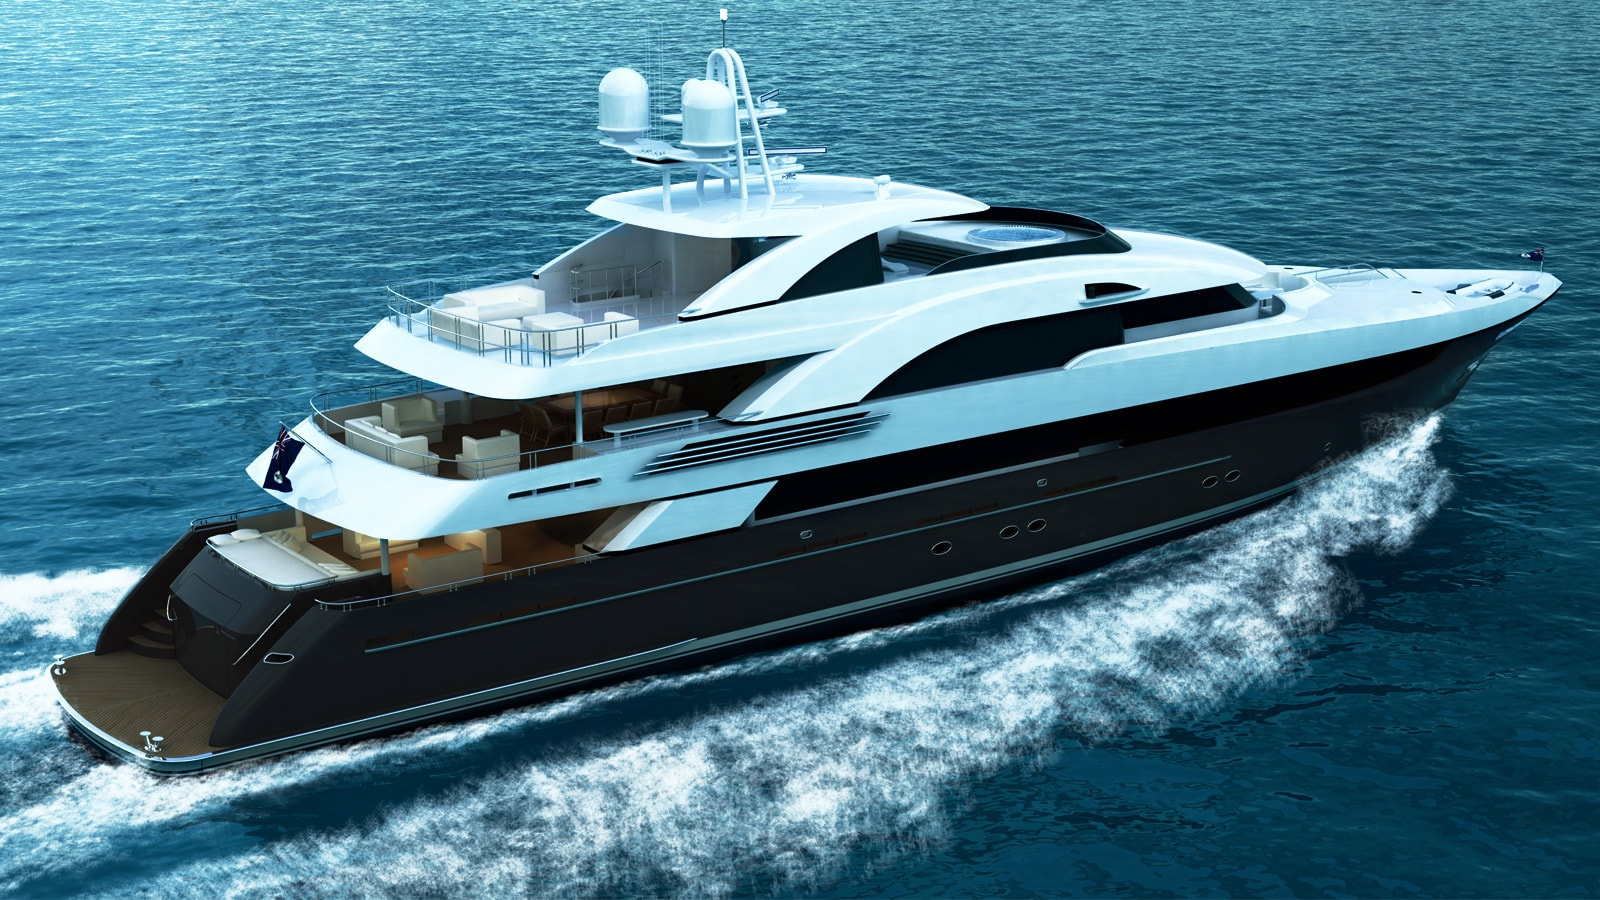 Trinity 51 Luxury Yacht For Sale